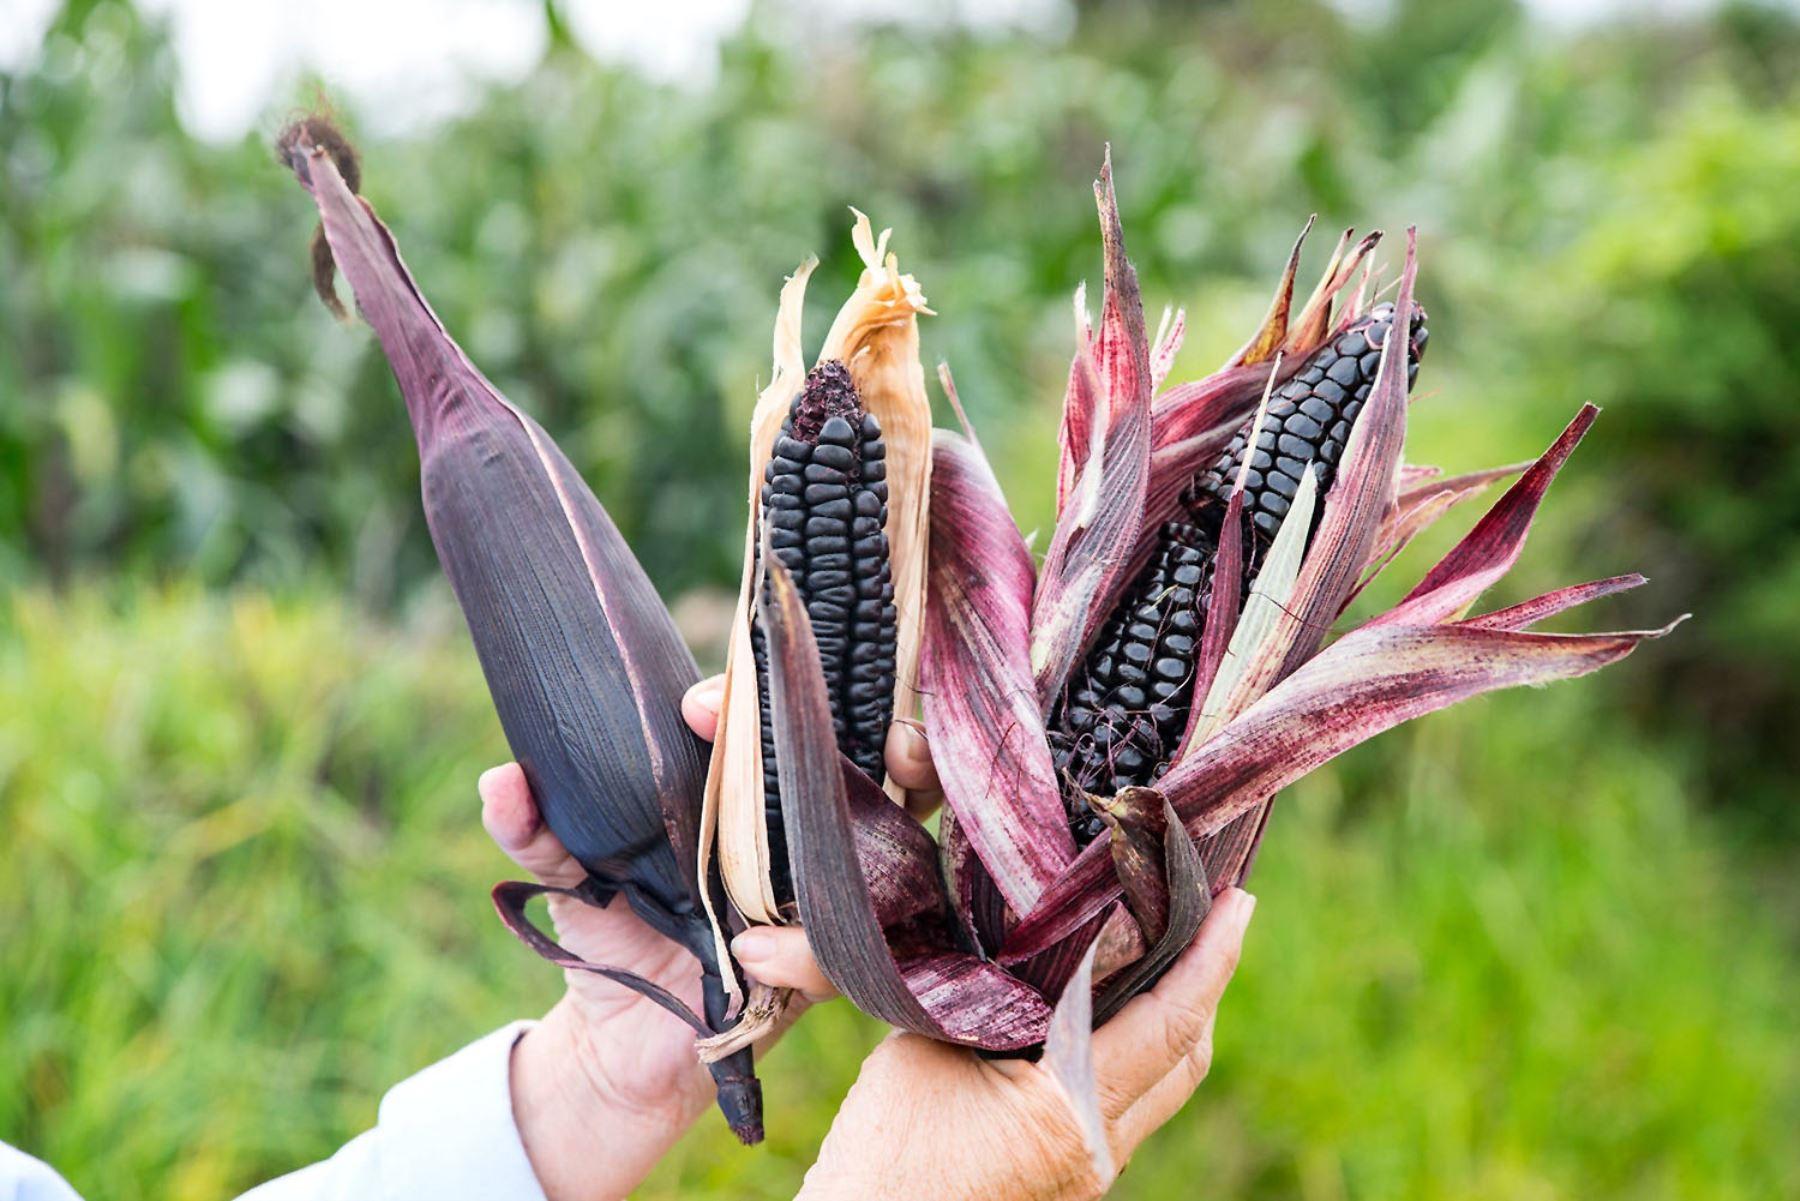 INIA investiga variedades de maíz morado con poderosas propiedades medicinales. ANDINA/Difusión